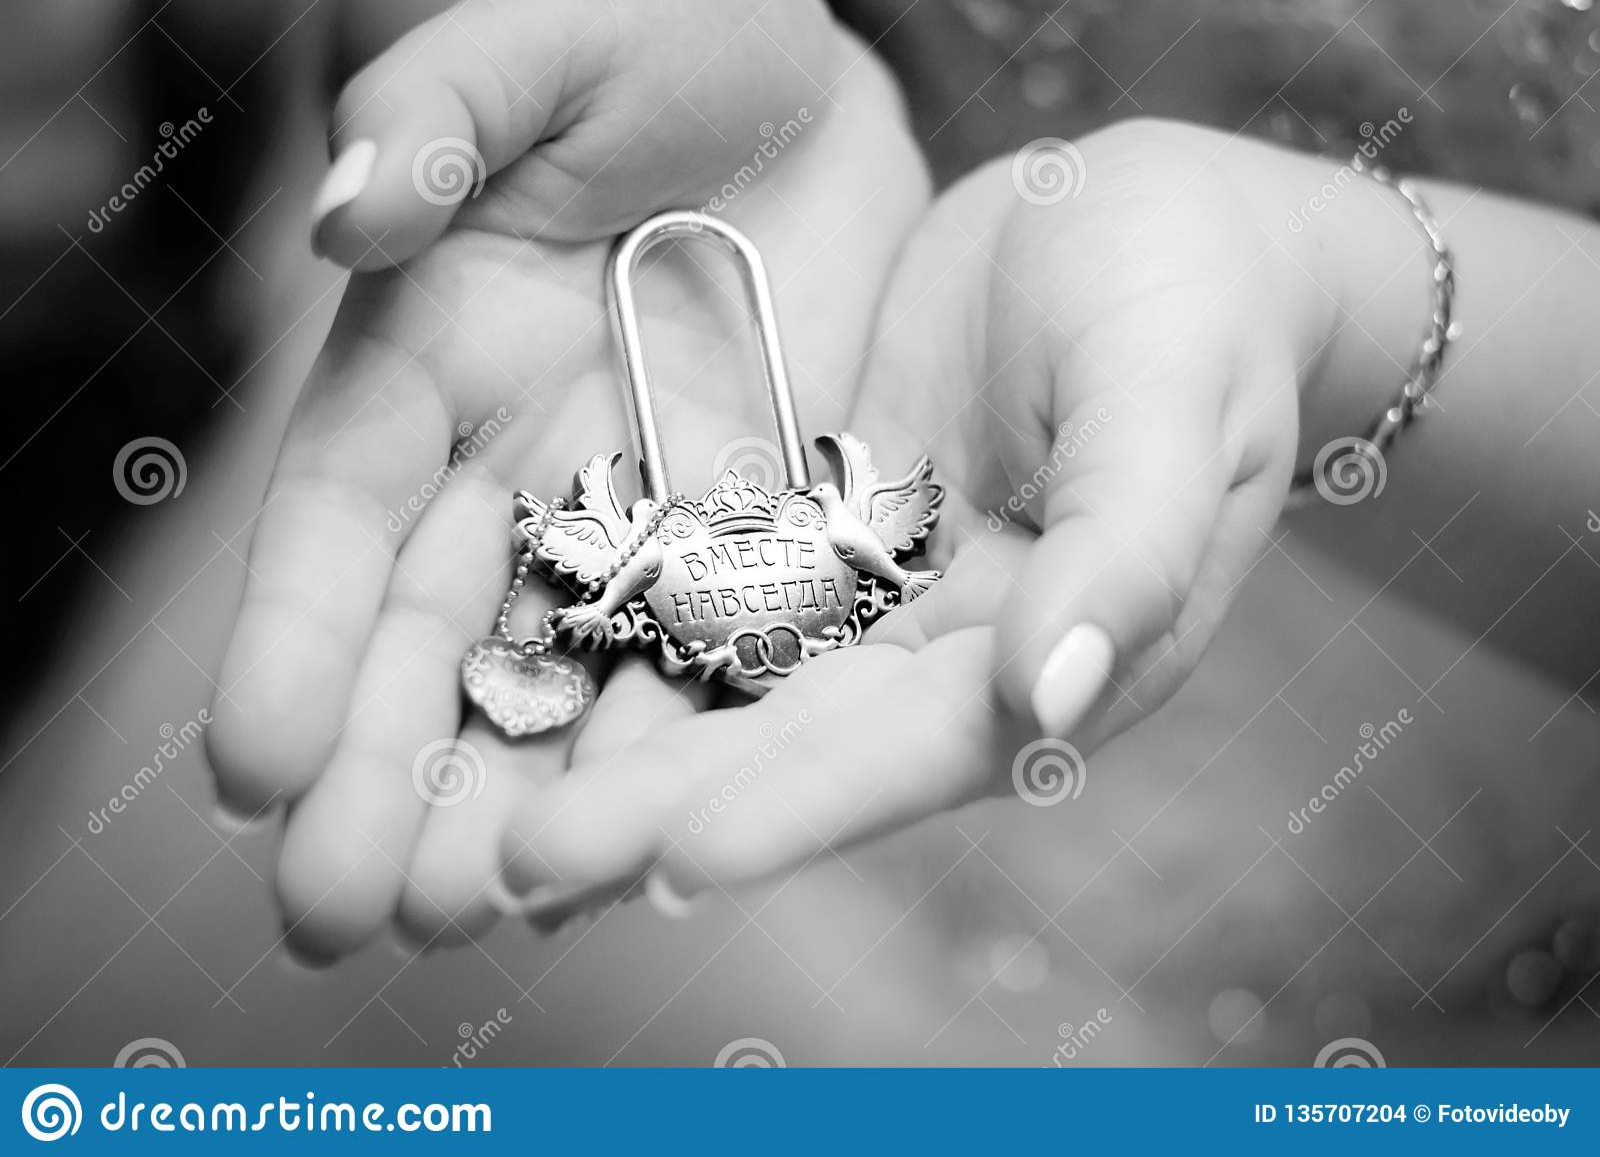 Handen van bruid en bruidegom met uitstekend slot